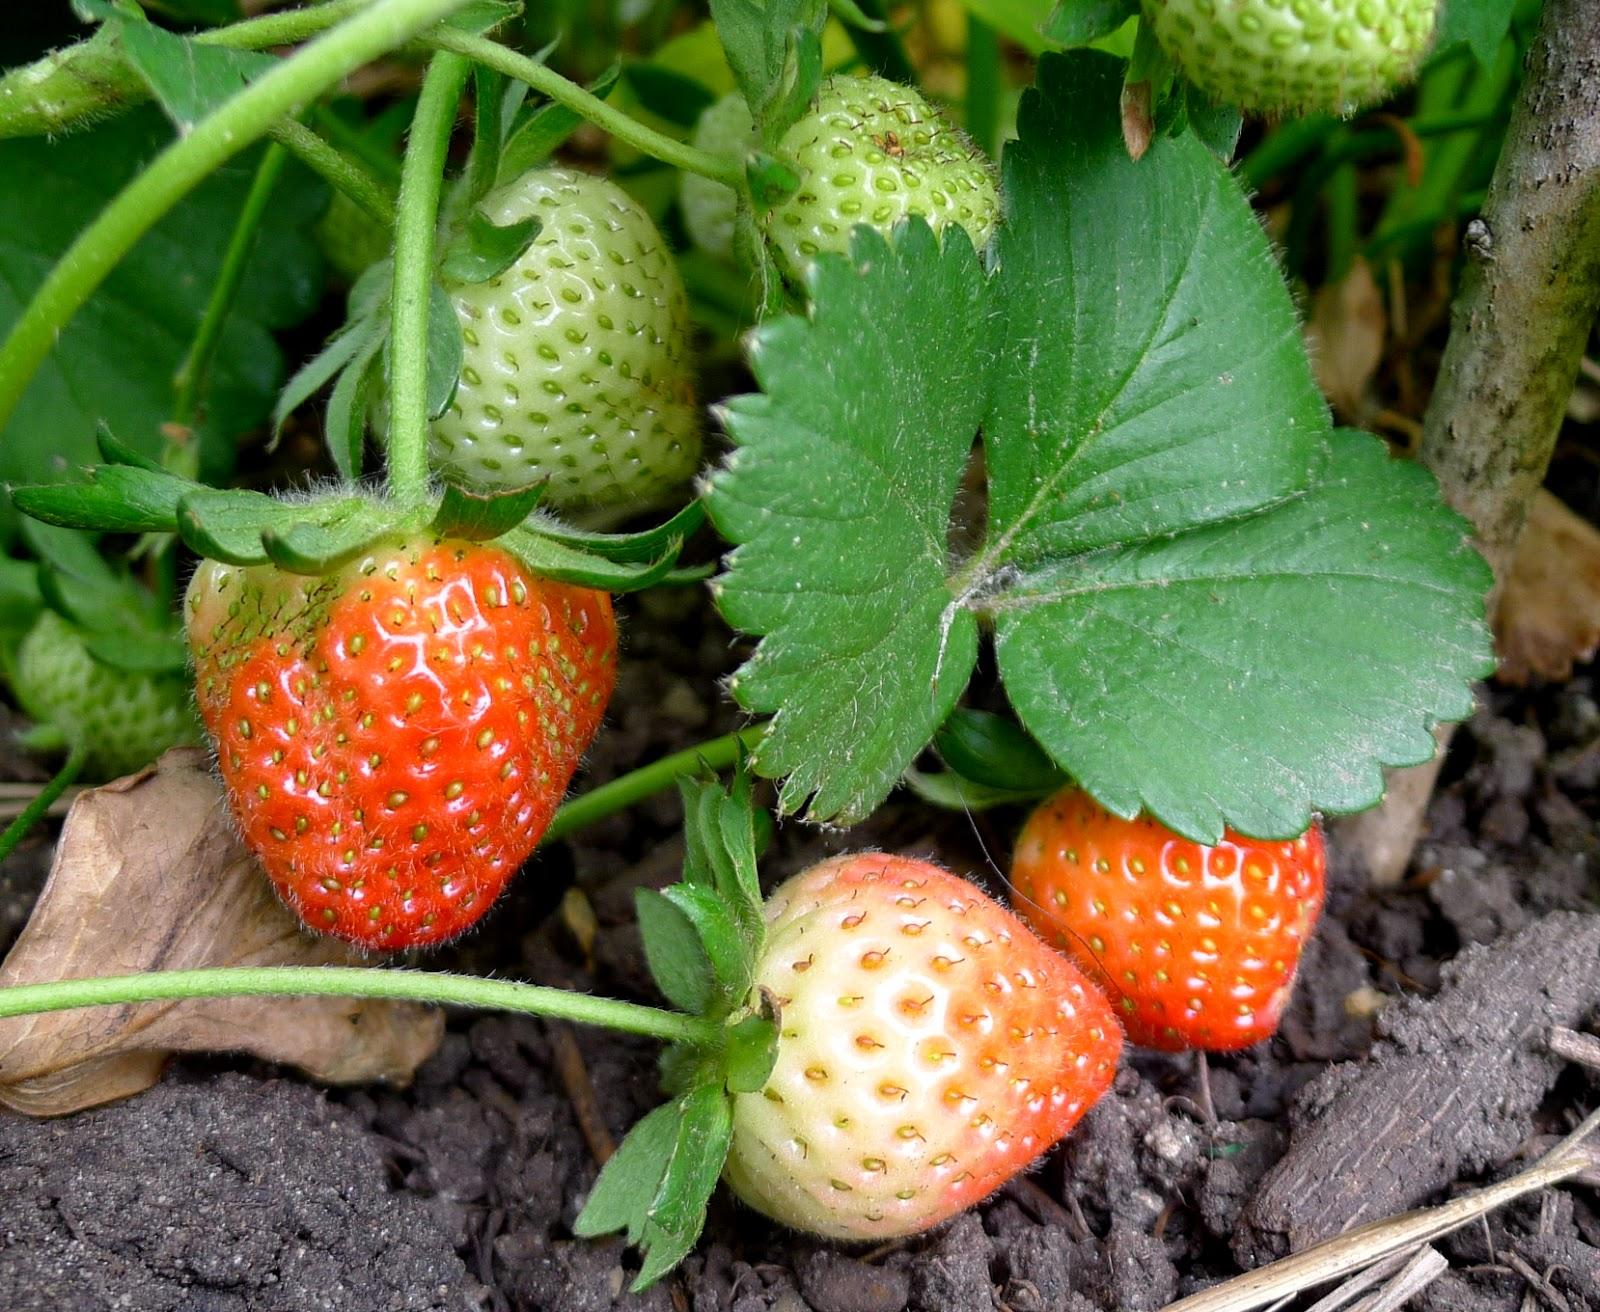 Everbearing strawberries, urban farming